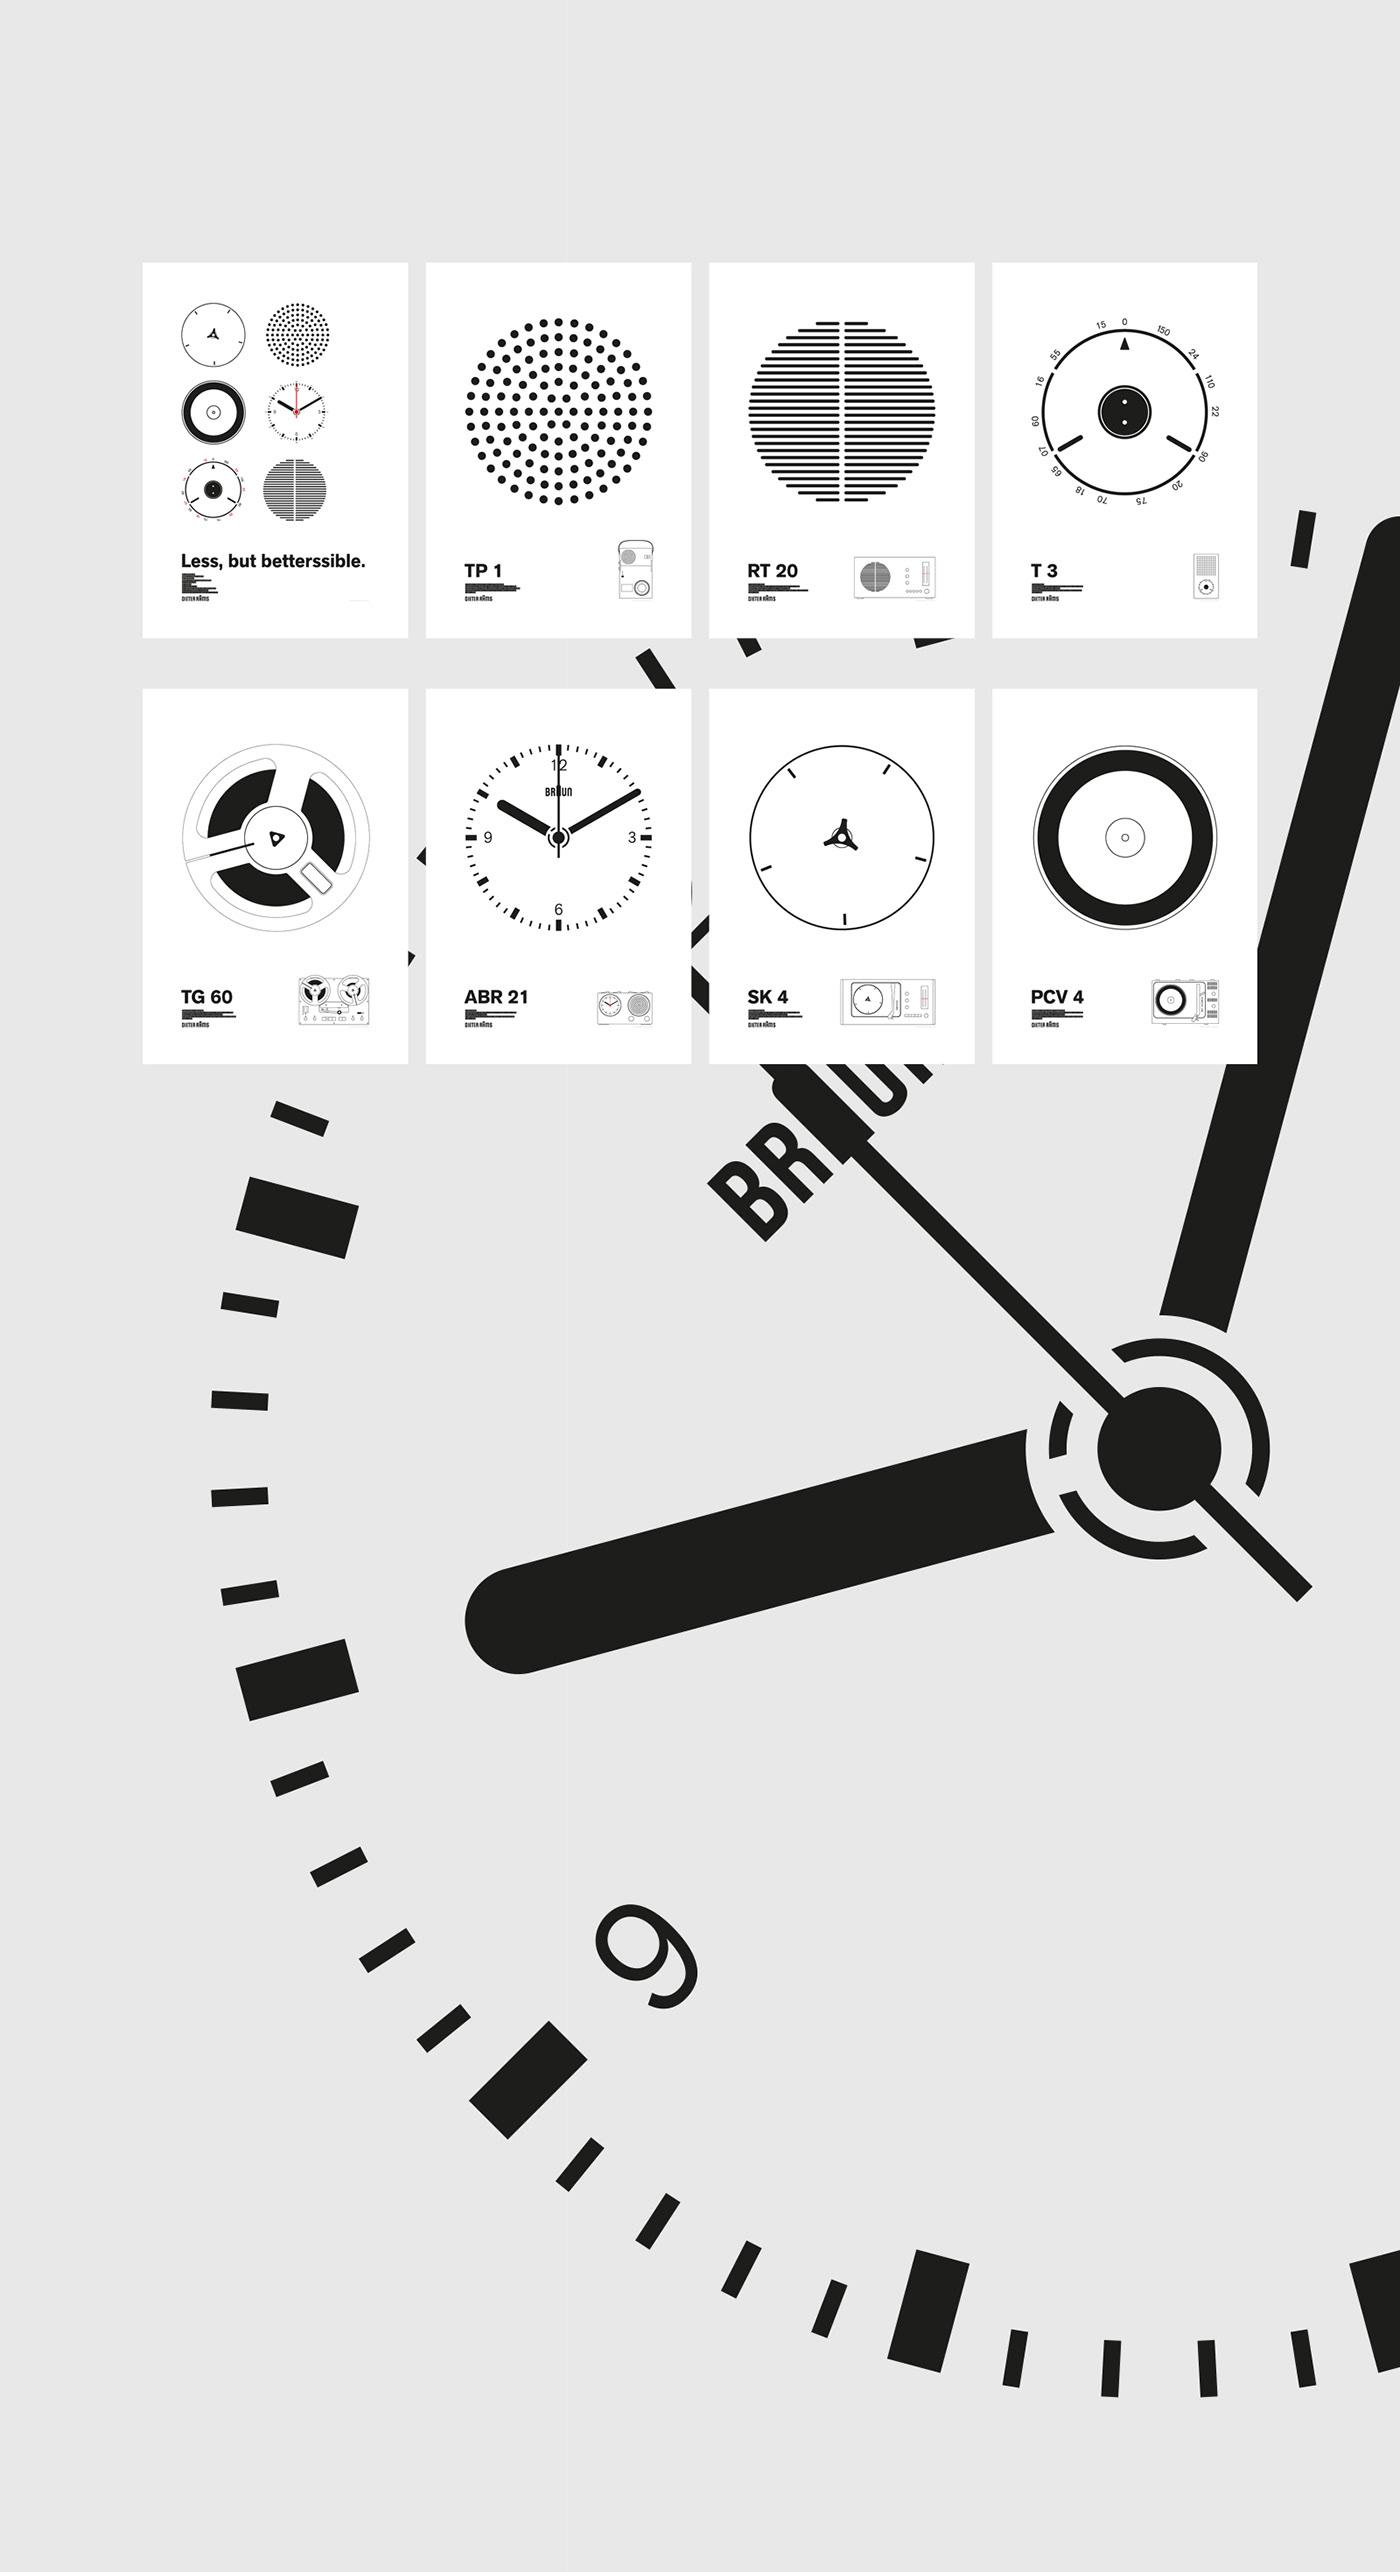 bauhaus braun devices Dieter Rams iconic ILLUSTRATION  infographic poster print